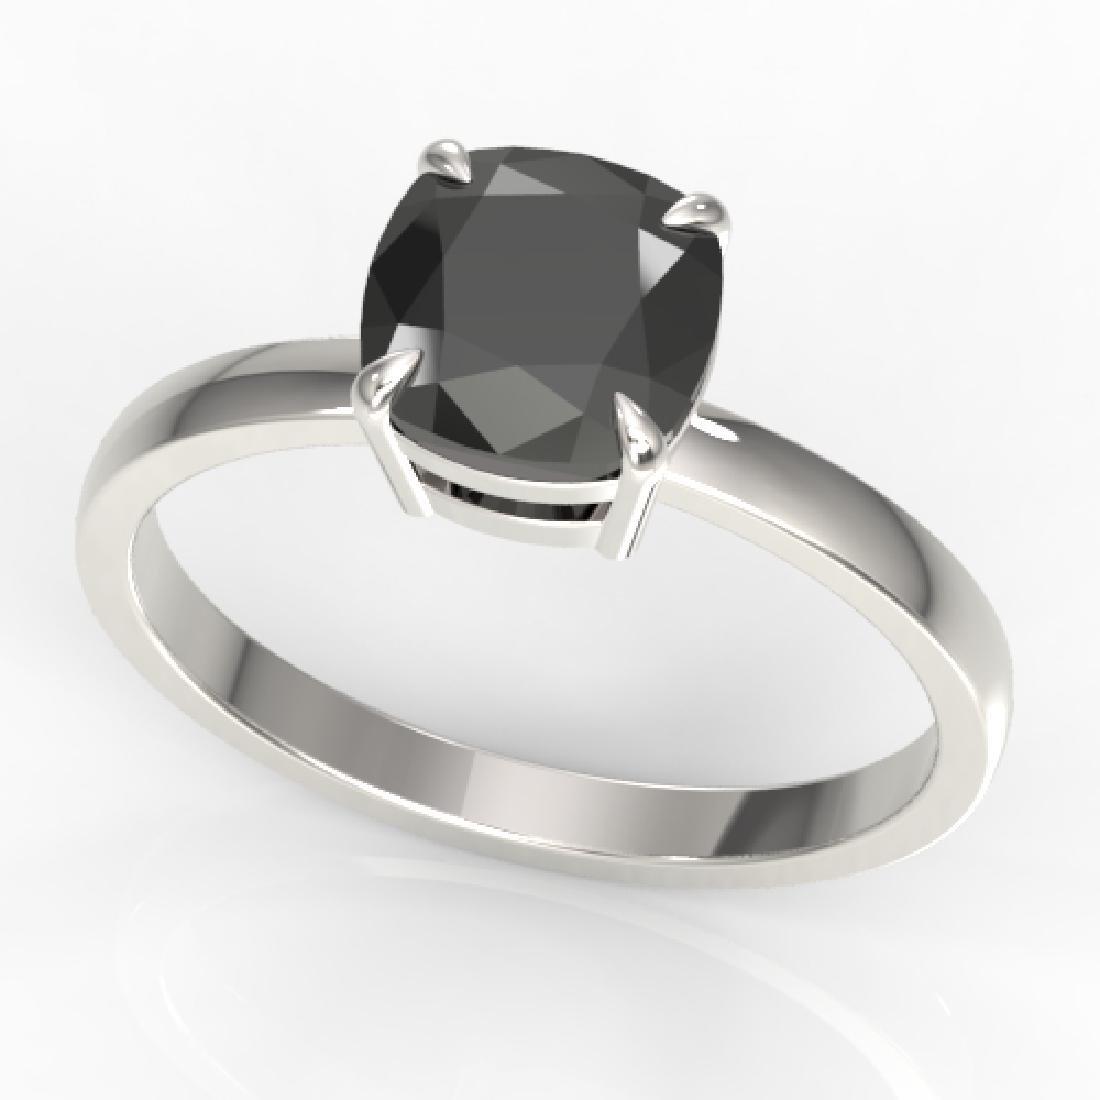 3 CTW Cushion Cut Black VS/SI Diamond Solitaire Ring - 2